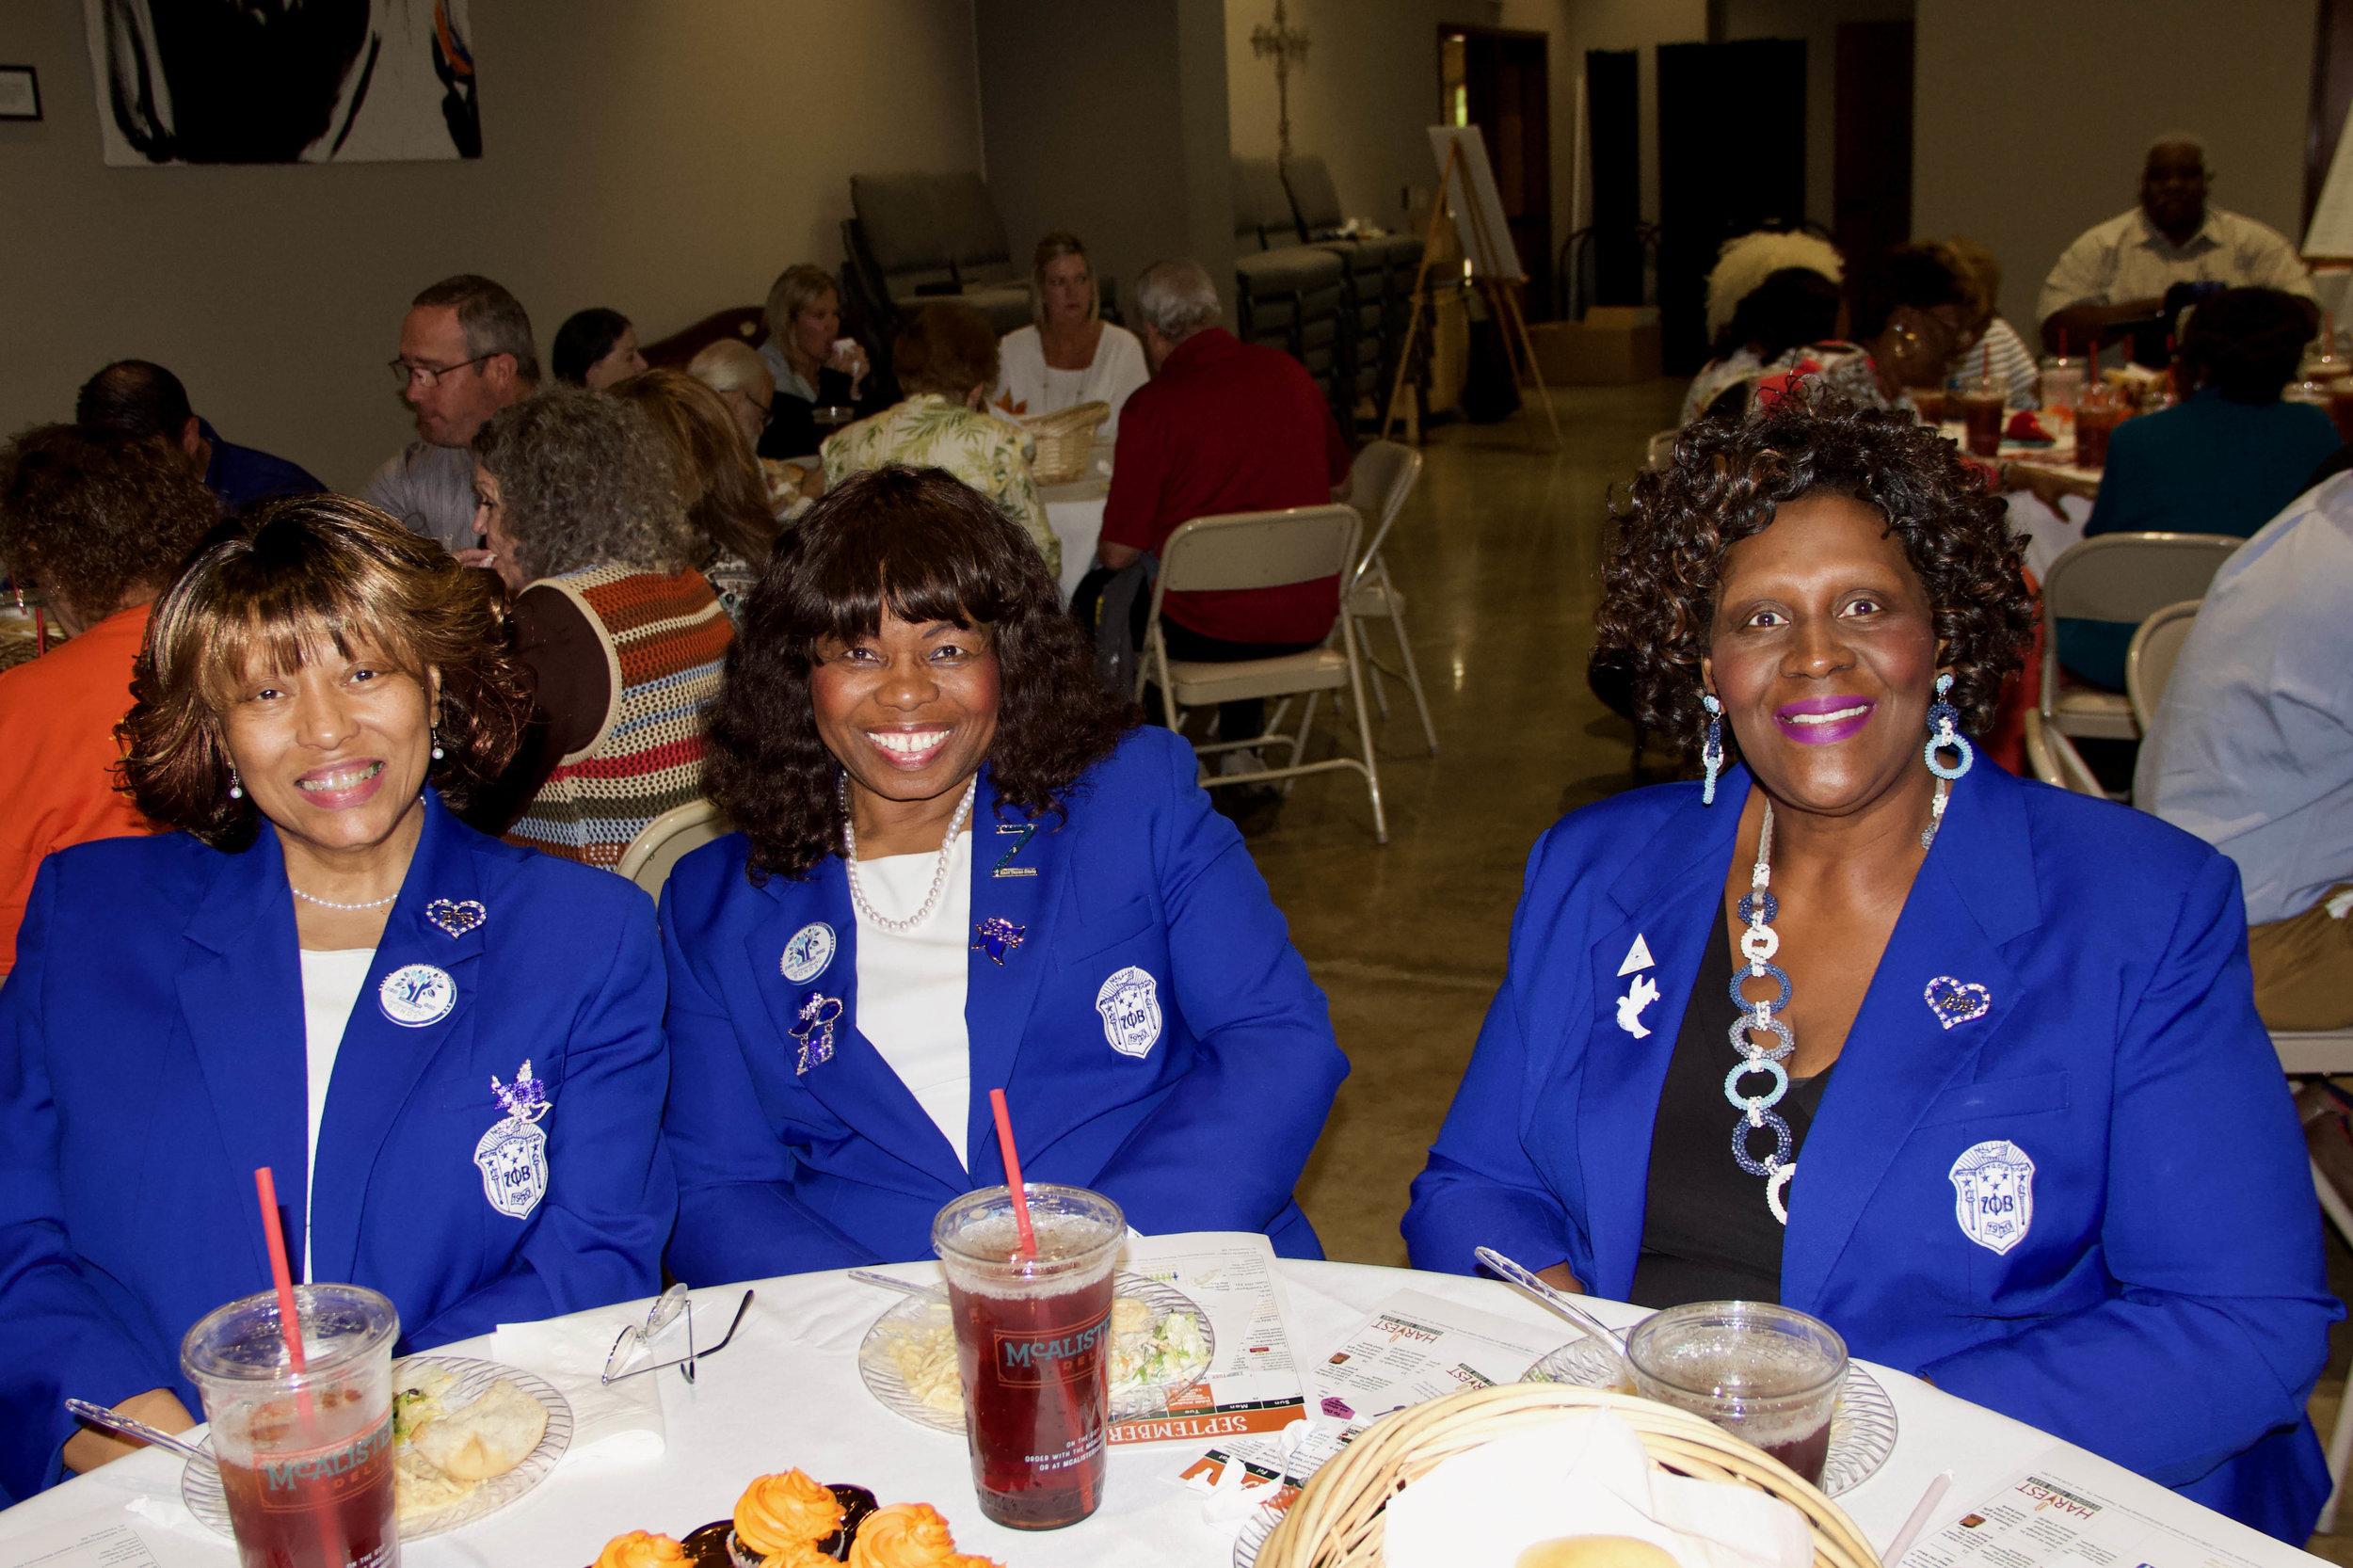 Jo Ann Rice, Maxine Crittenden and Cynthia Henderson